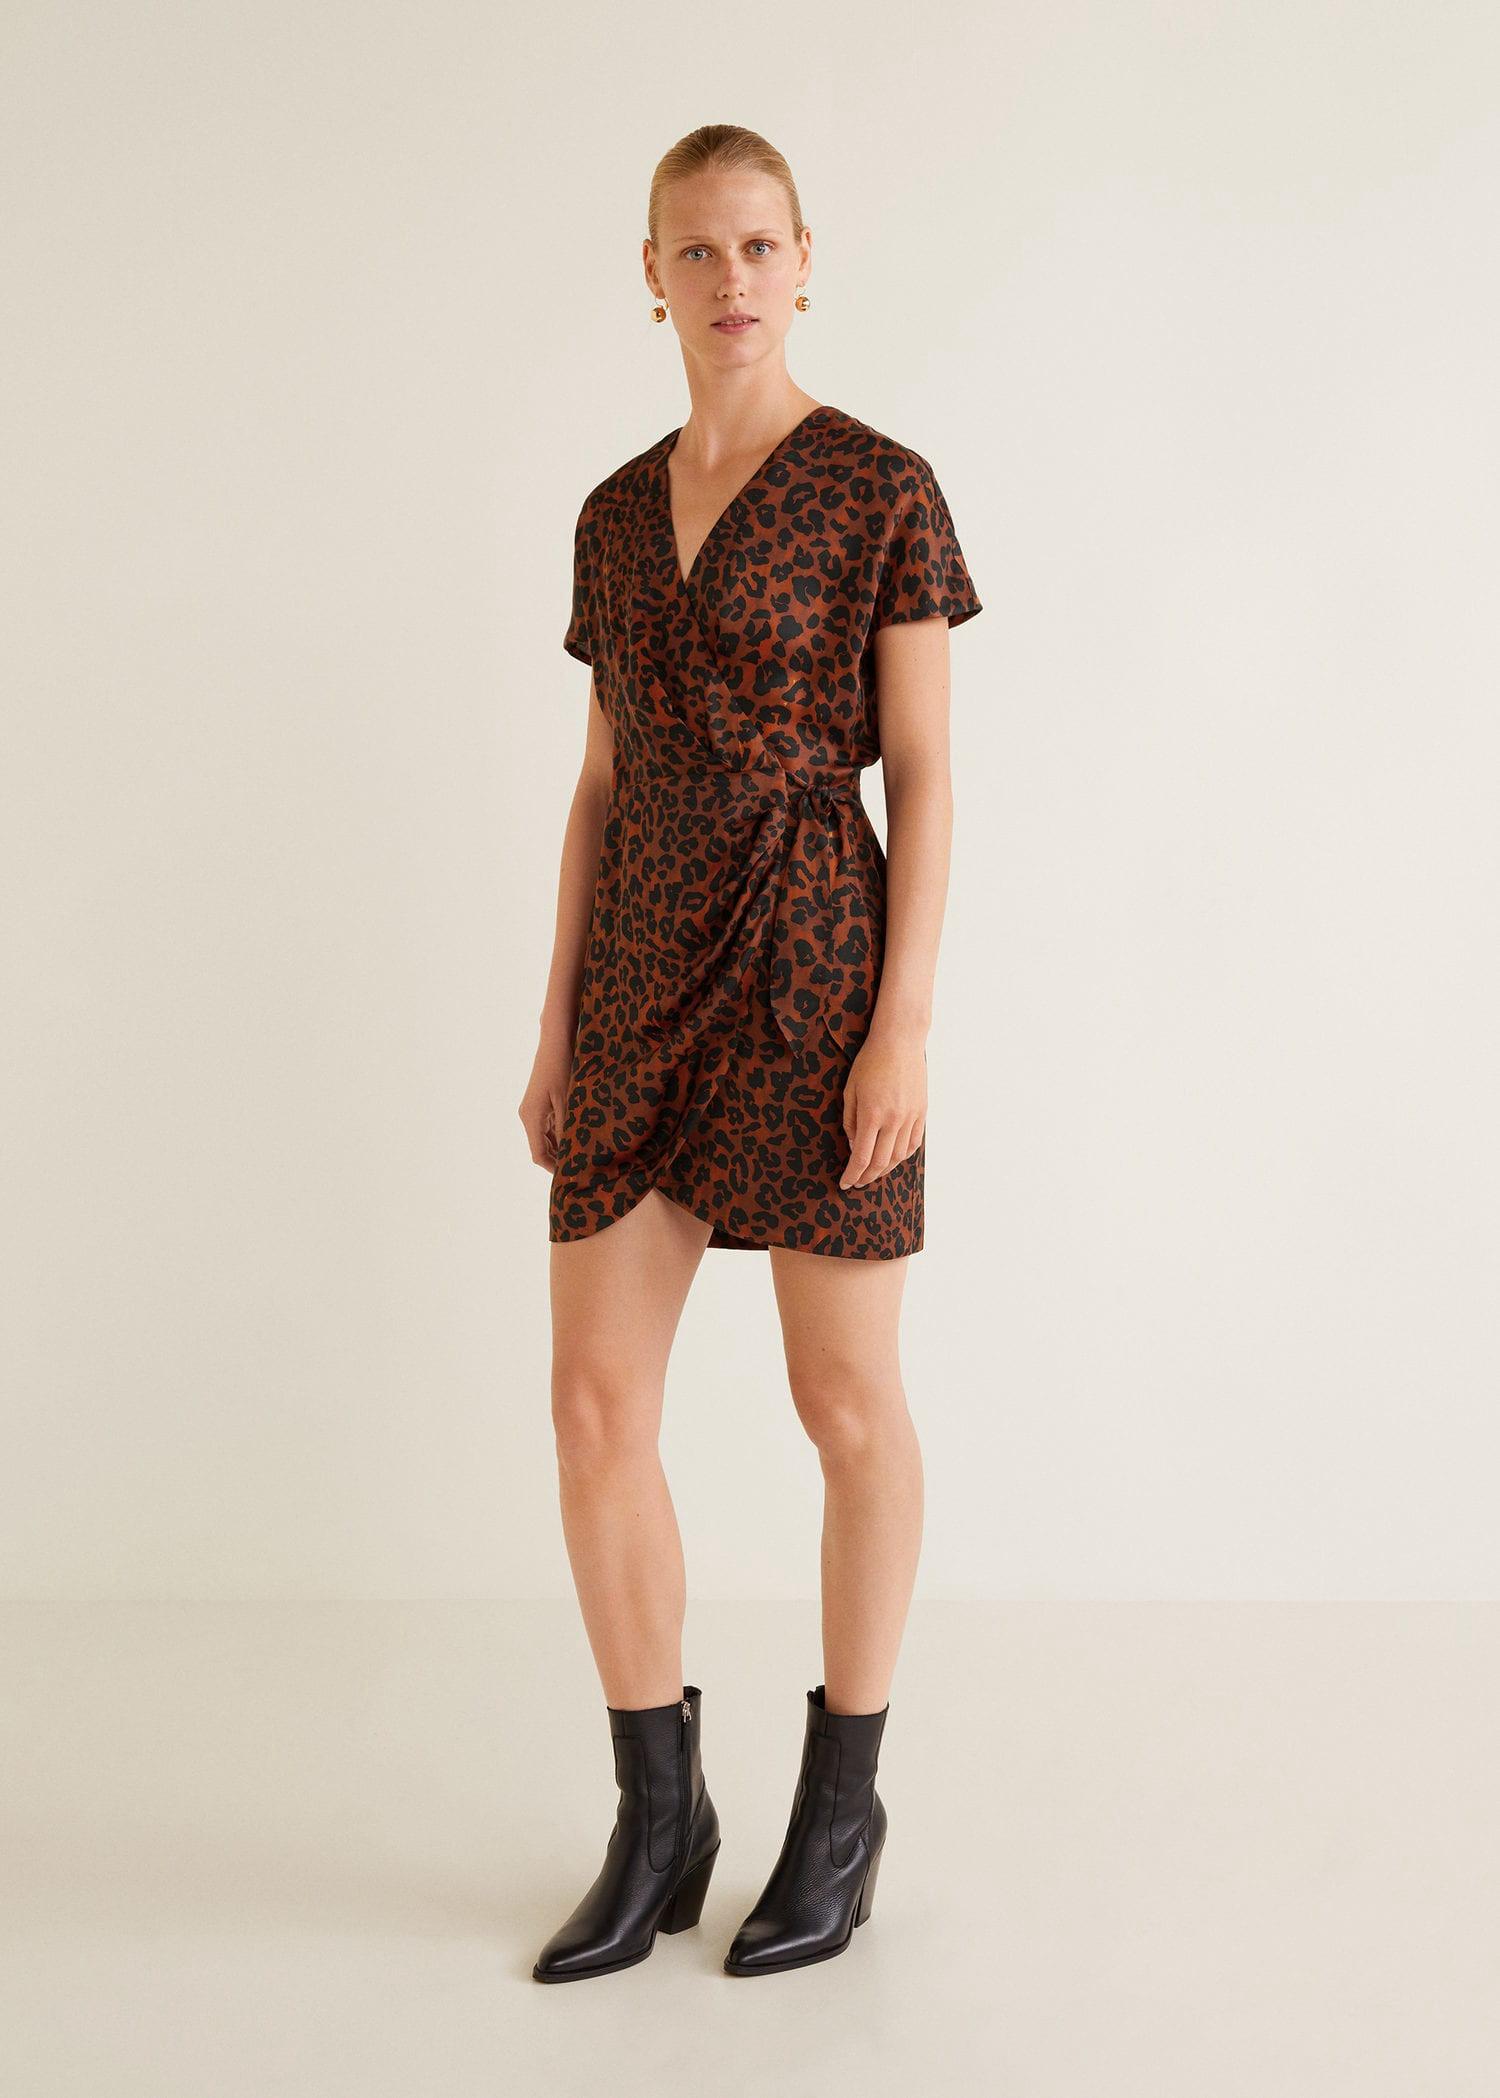 c851c0fe9d8 Mango Leopard Print Dress - 2 in 2019